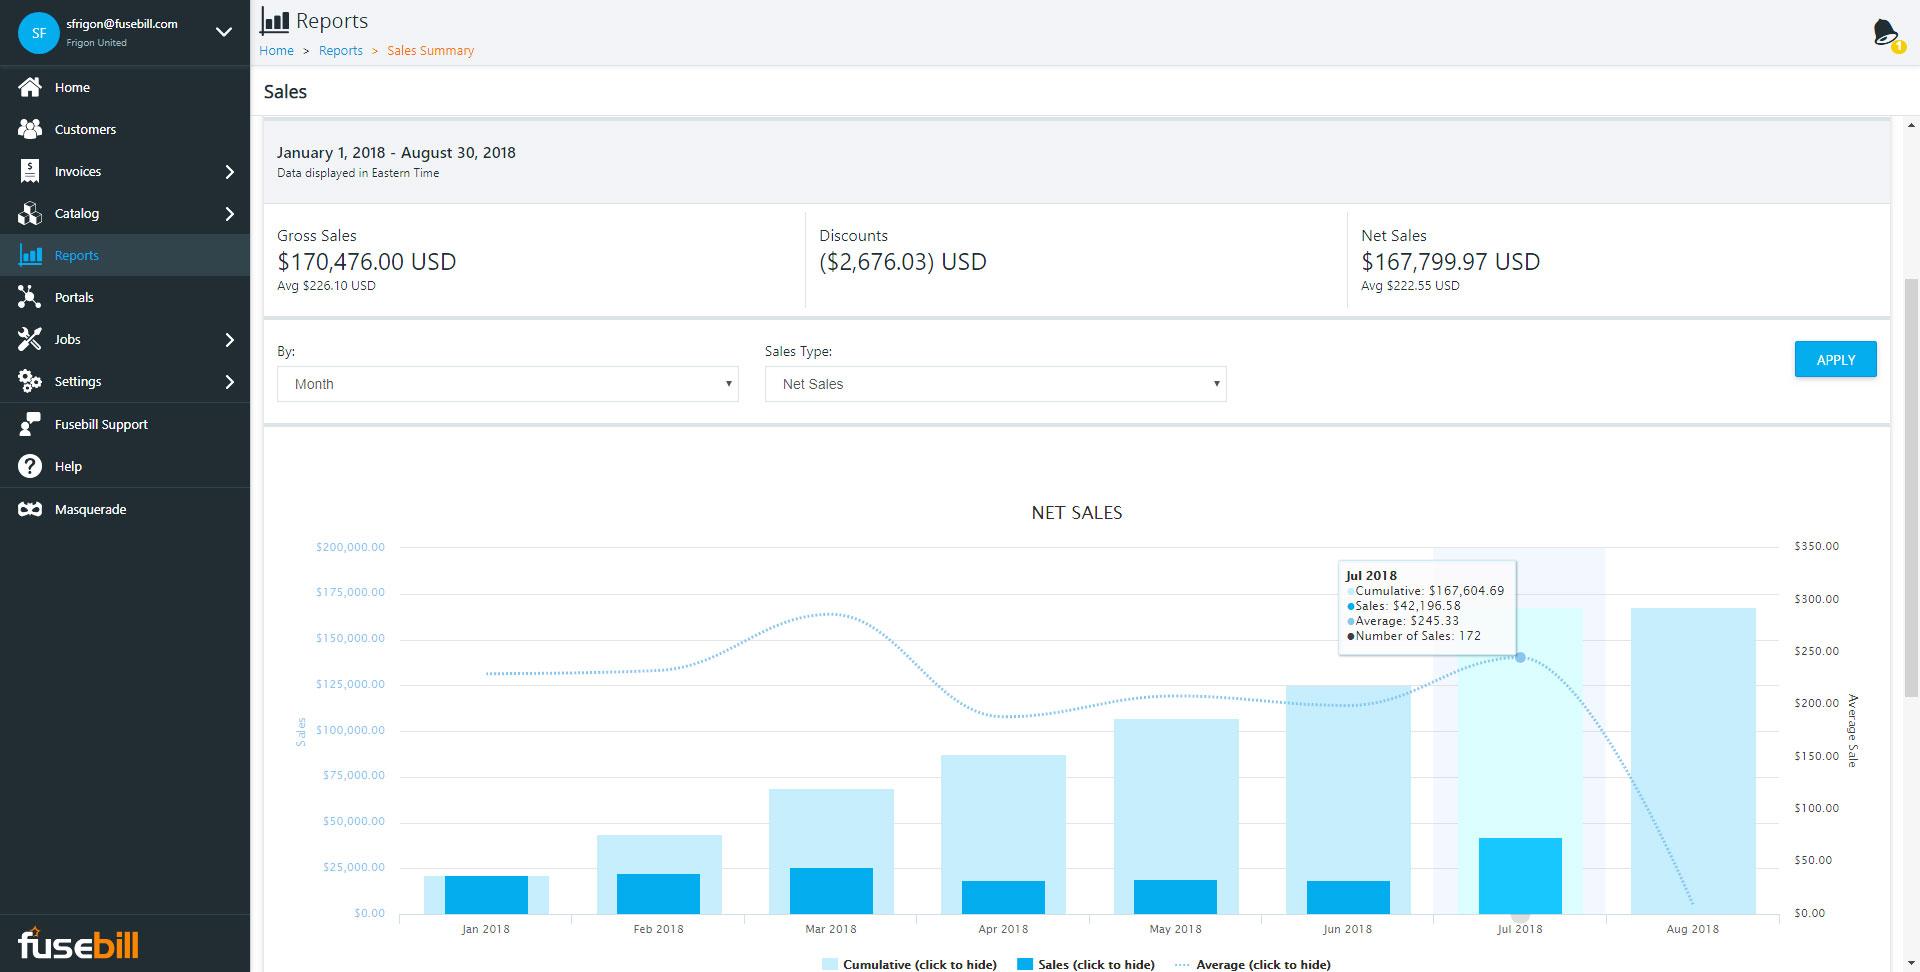 Sales Summary Report